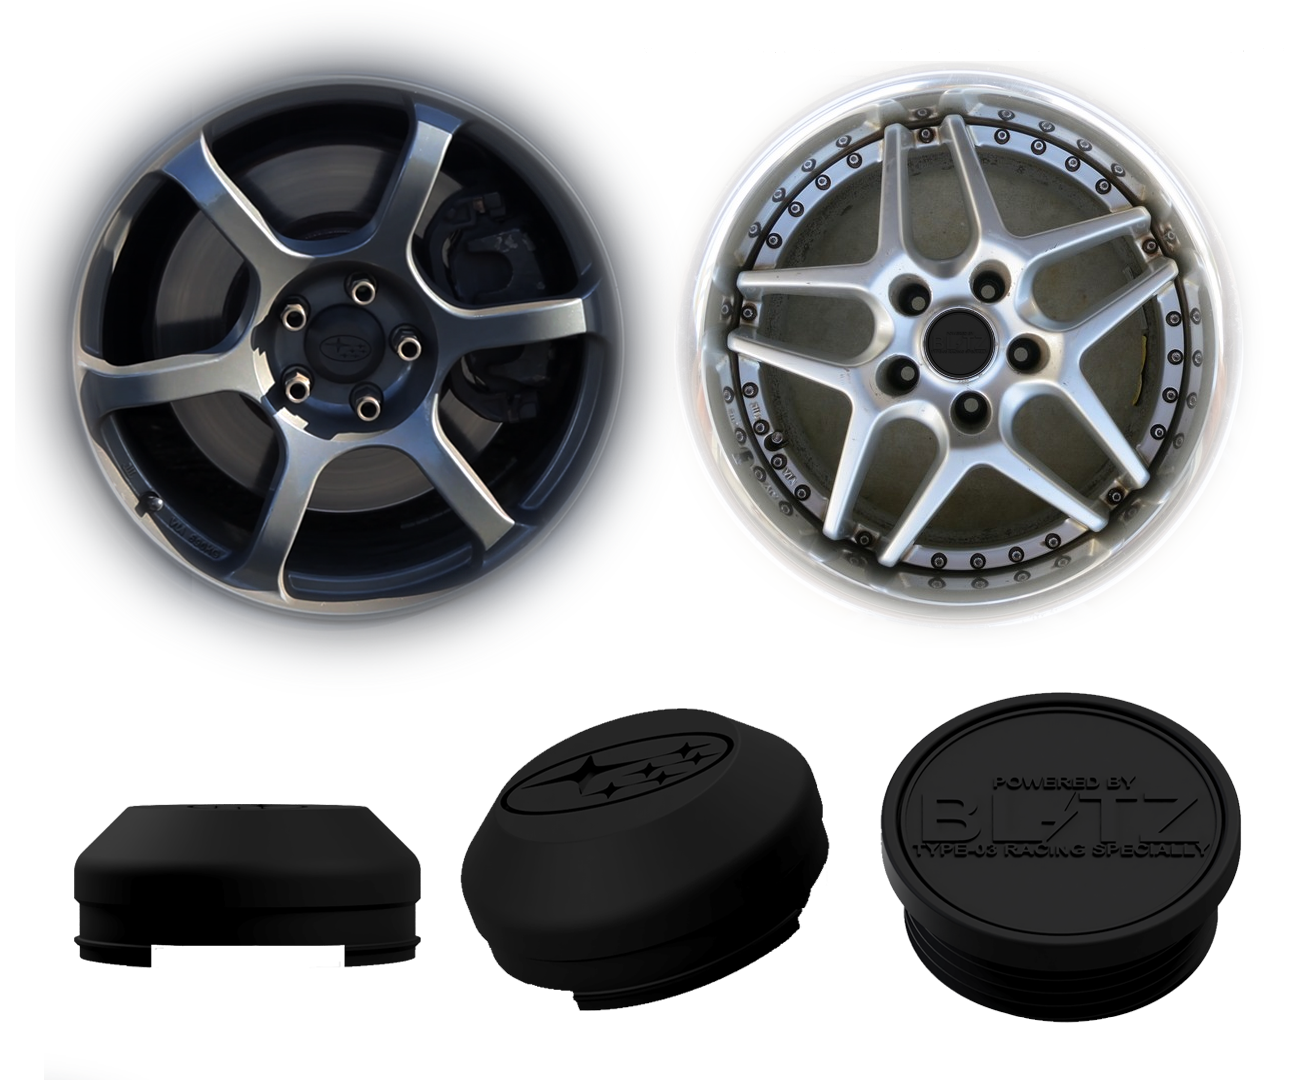 Custom 3D Printed Wheel Center Caps